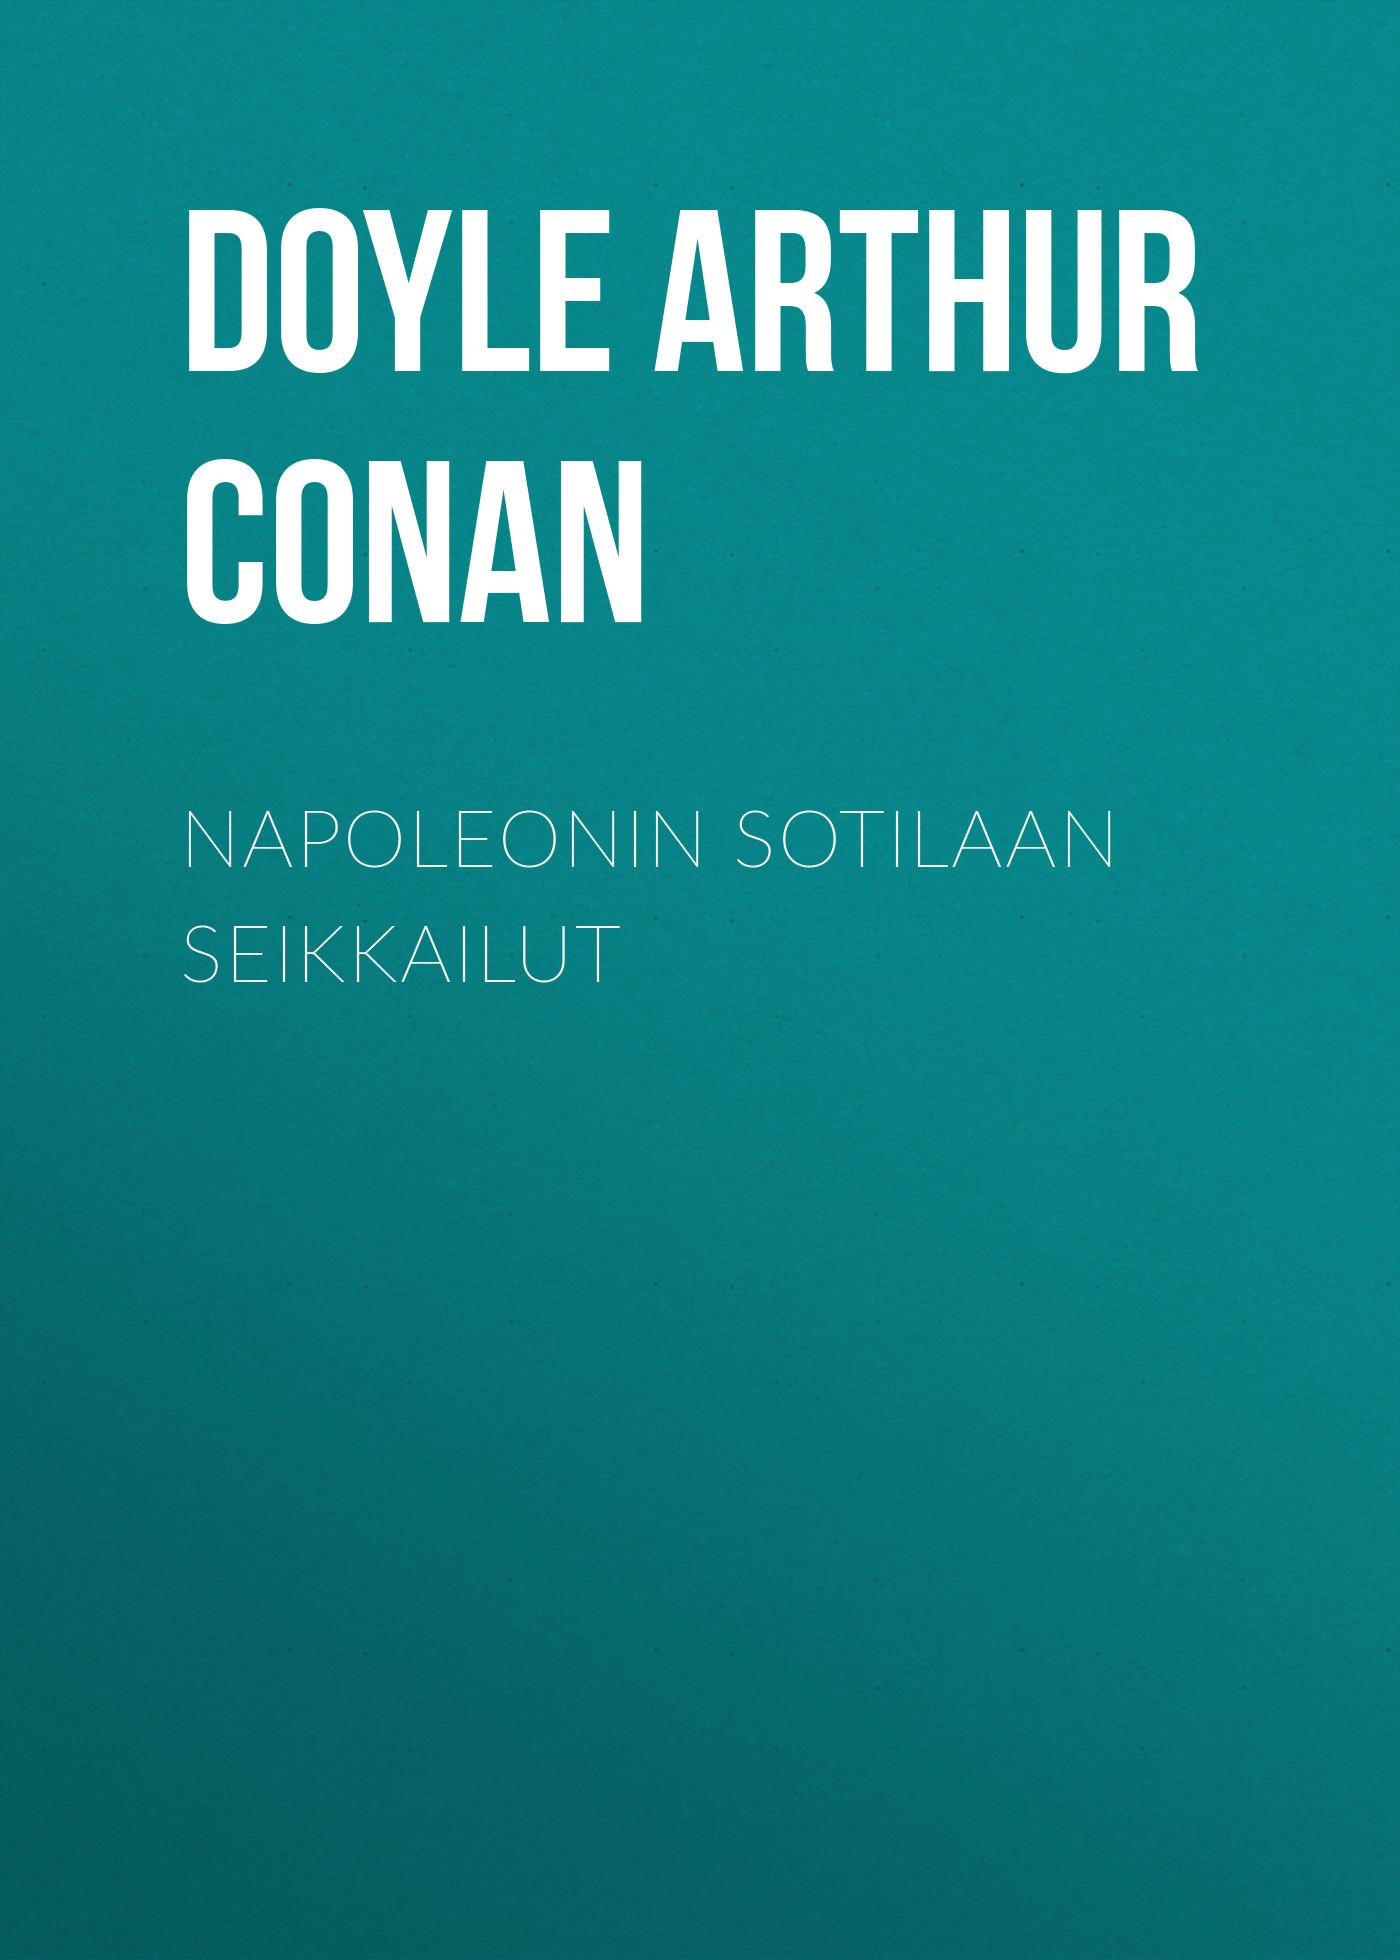 Doyle Arthur Conan Napoleonin sotilaan seikkailut arthur conan doyle through the magic door isbn 978 5 521 07201 9